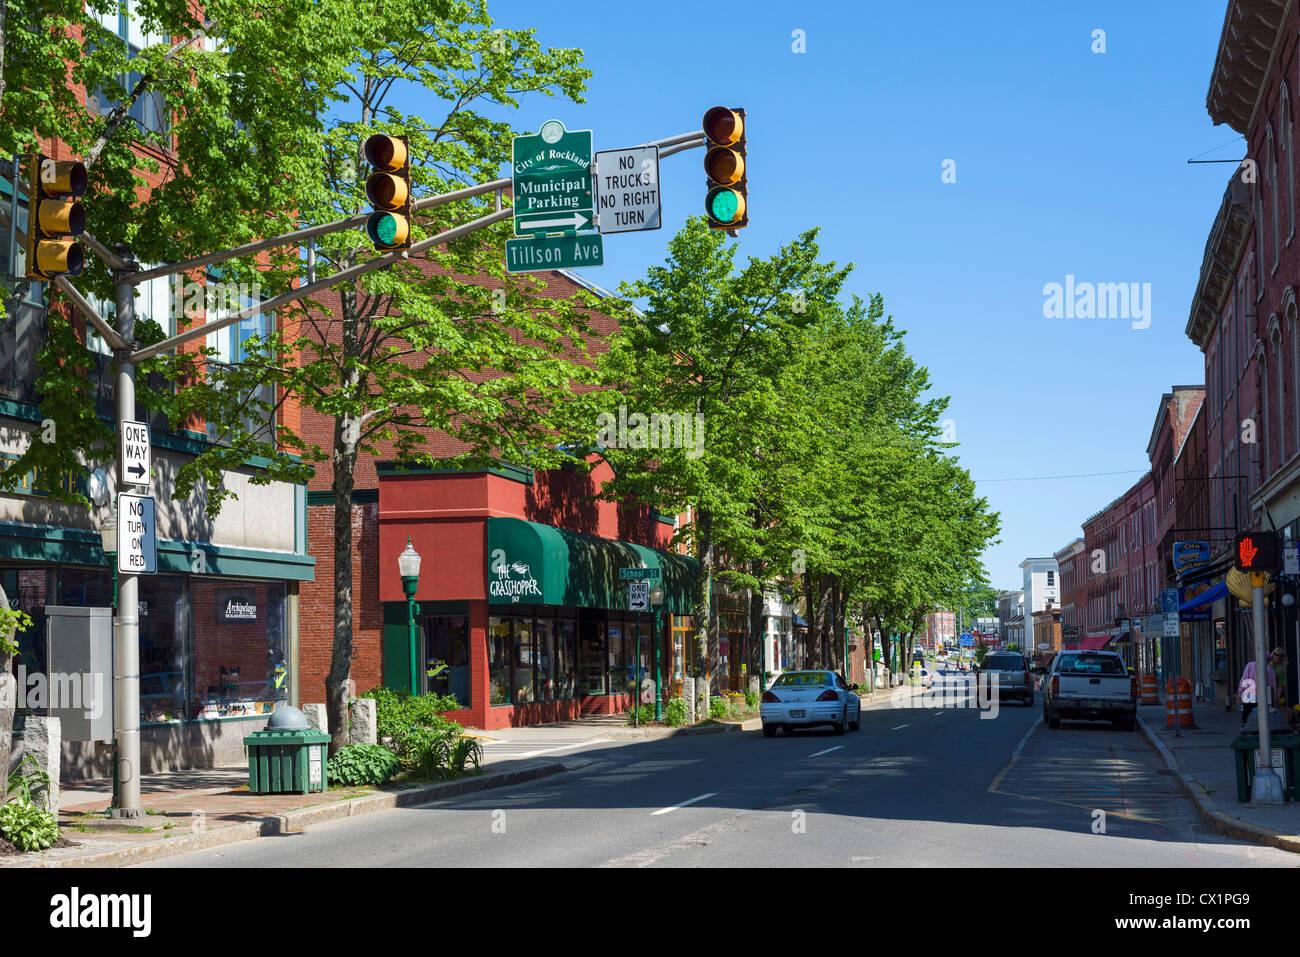 Main Street, Rockland, Knox County, Maine, USA - Stock Image